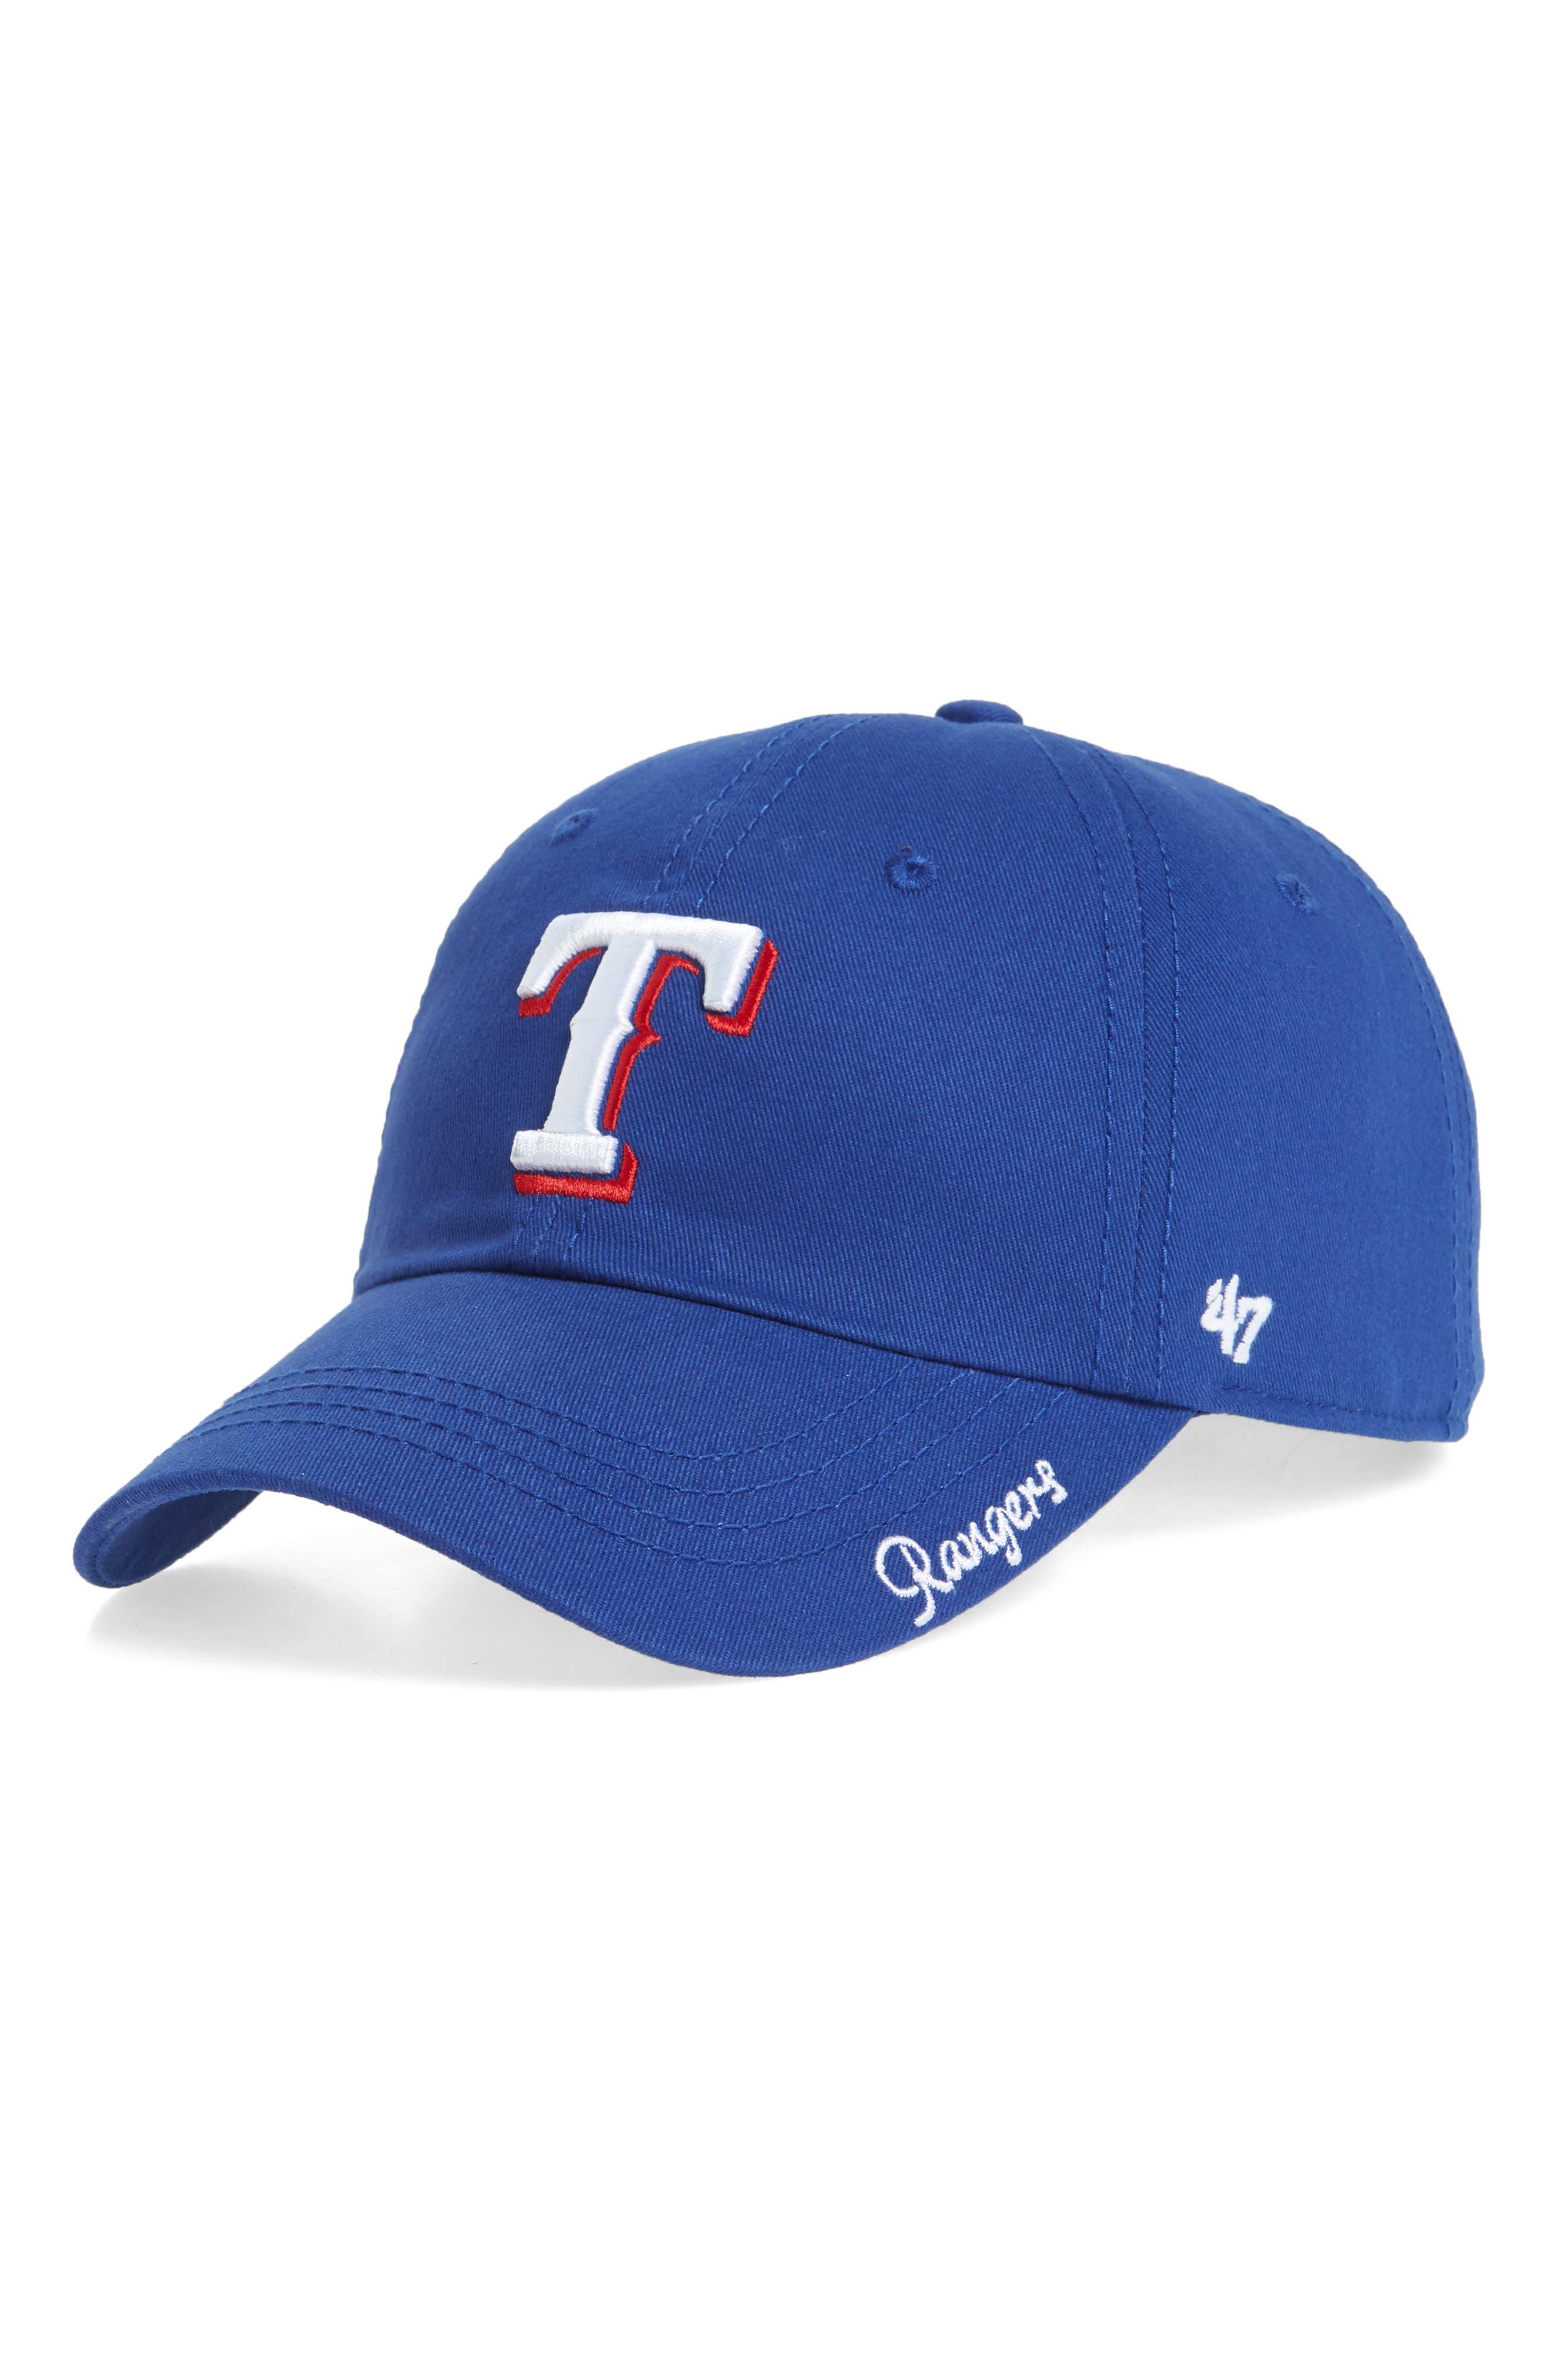 Miata Clean-Up Texas Rangers Baseball Cap,                         Main,                         color, 400